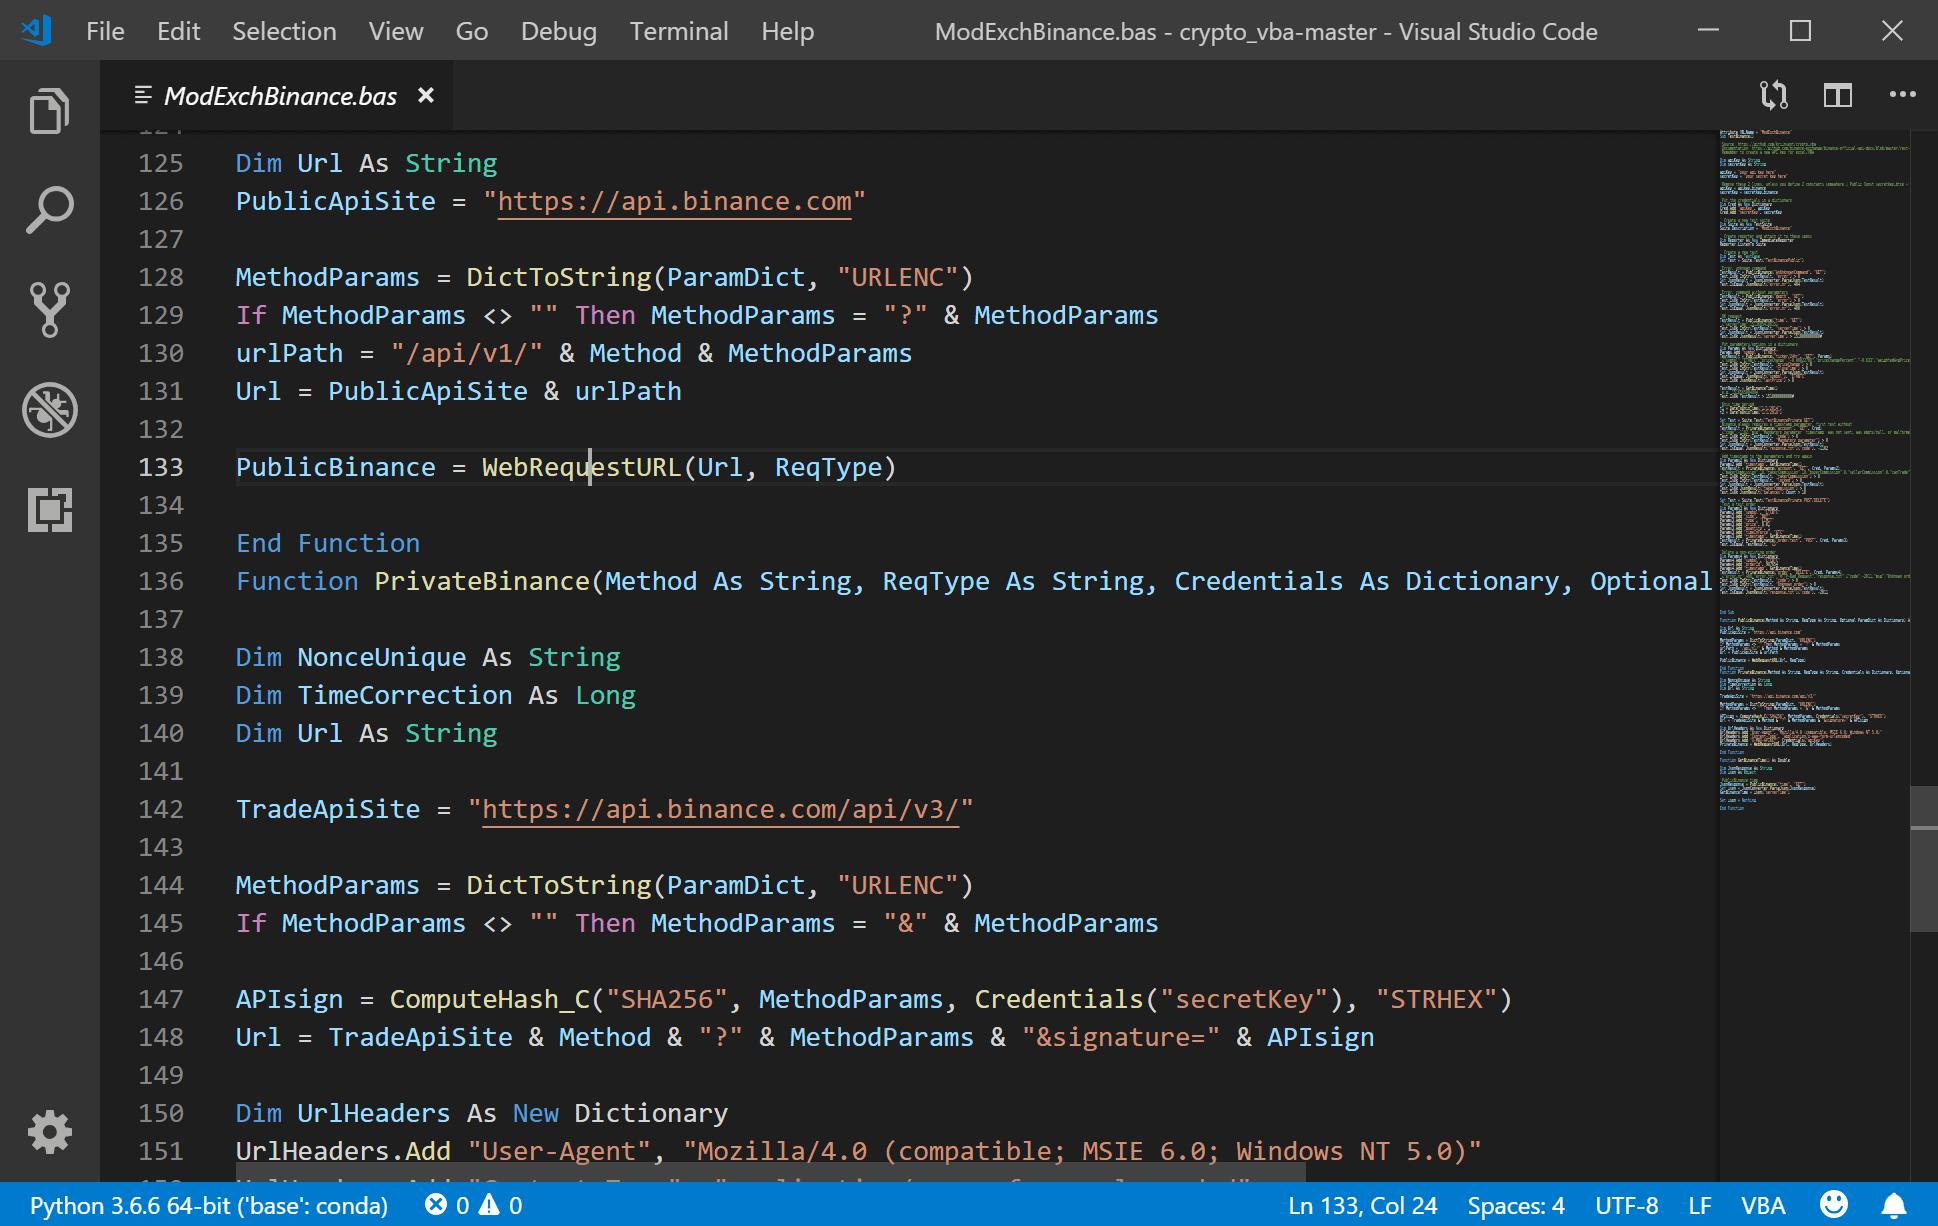 visual studio code vba syntax highlighting